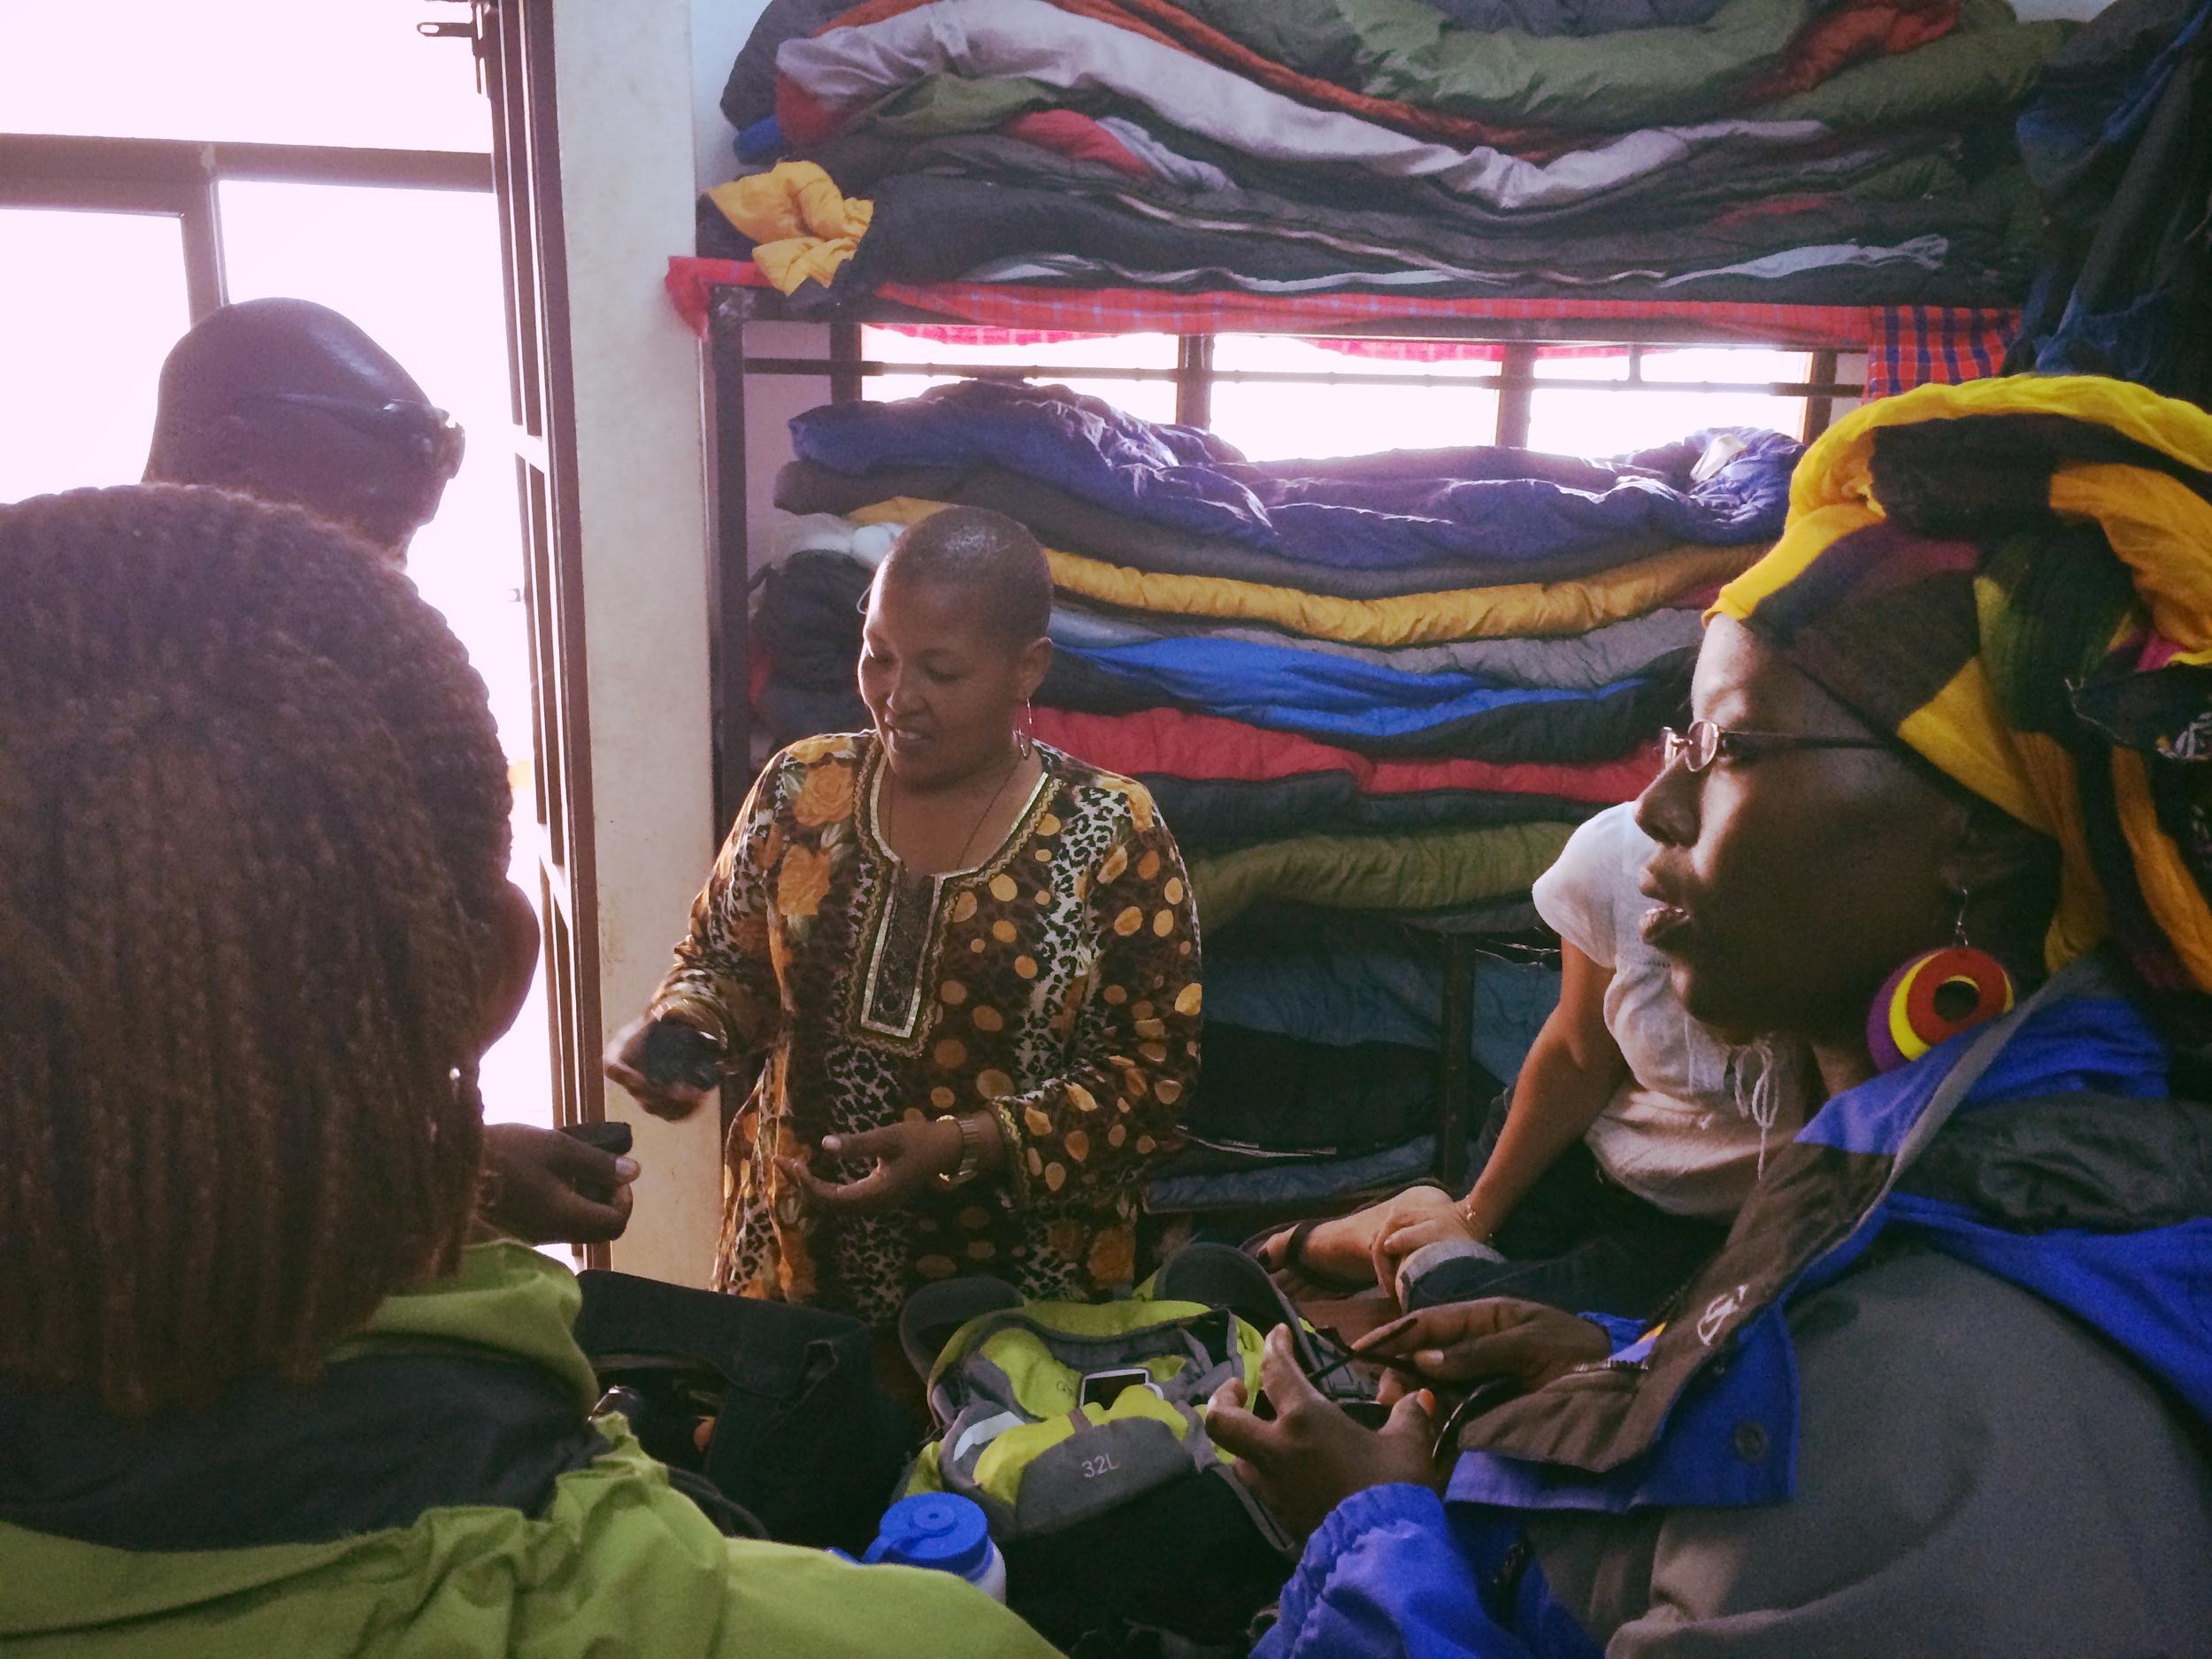 Give a Heart of Africa Kilimanjaro WHOA travel